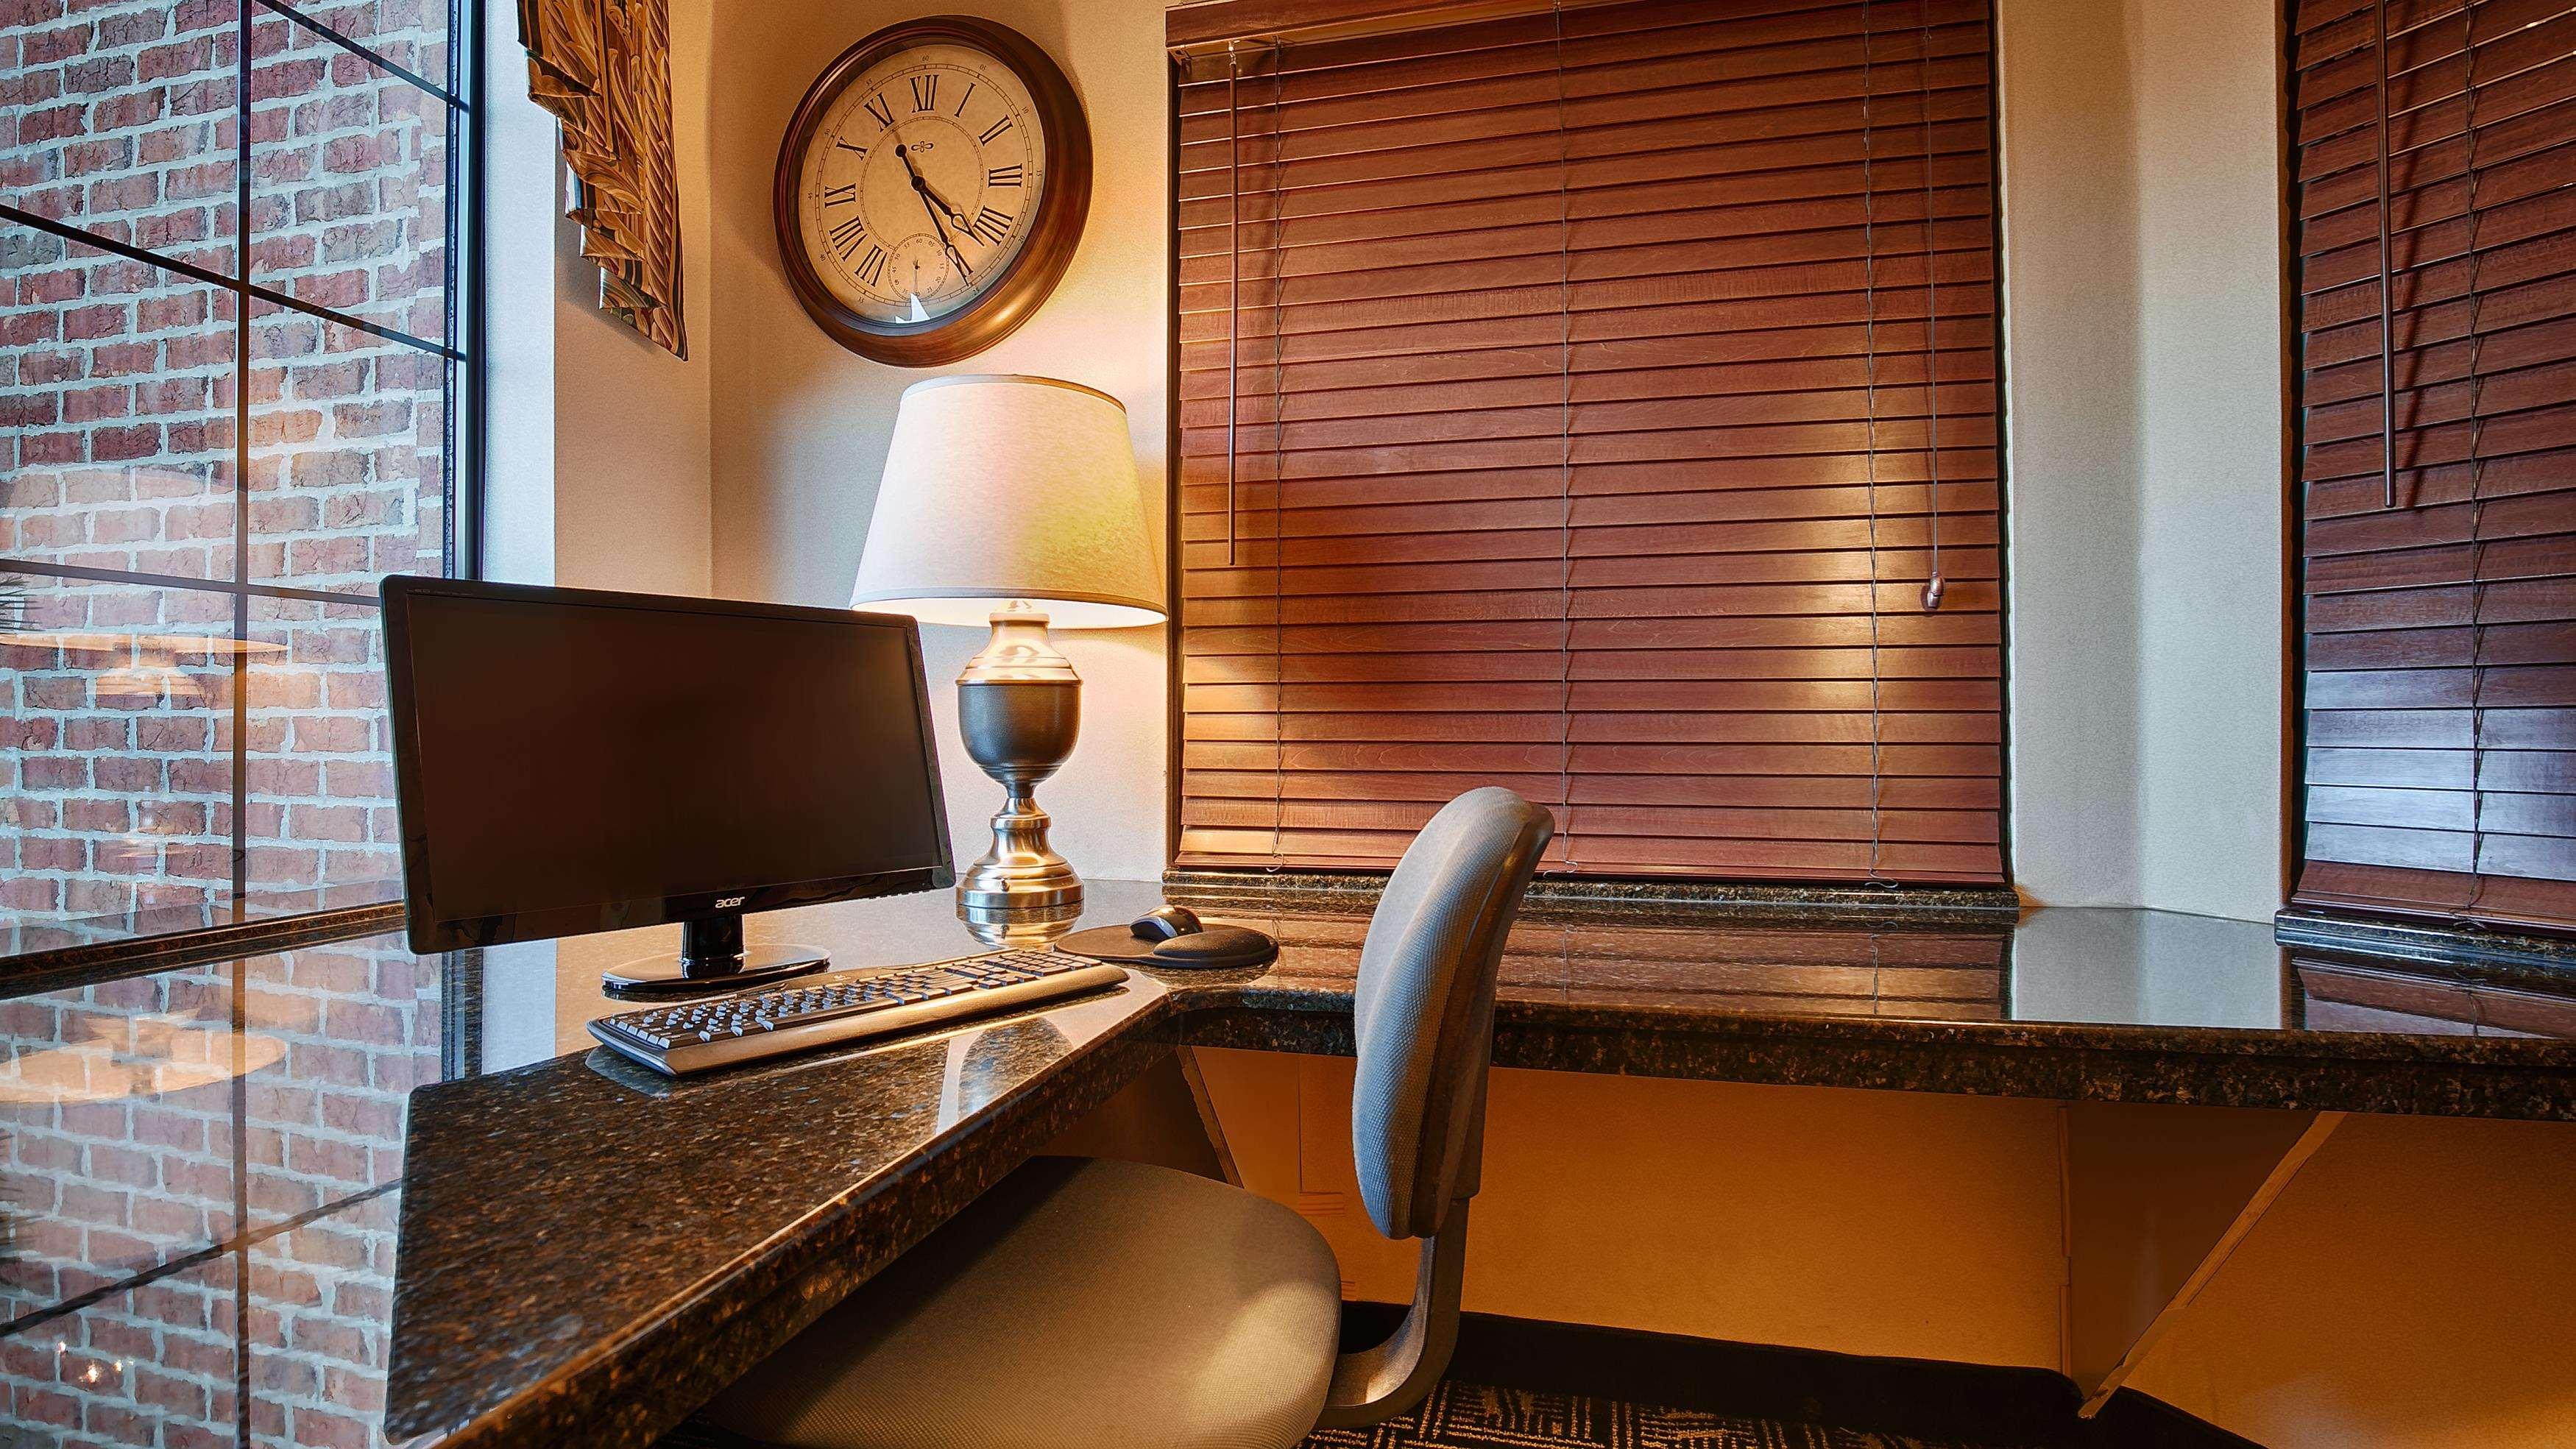 Best Western Plus Executive Hotel & Suites image 17